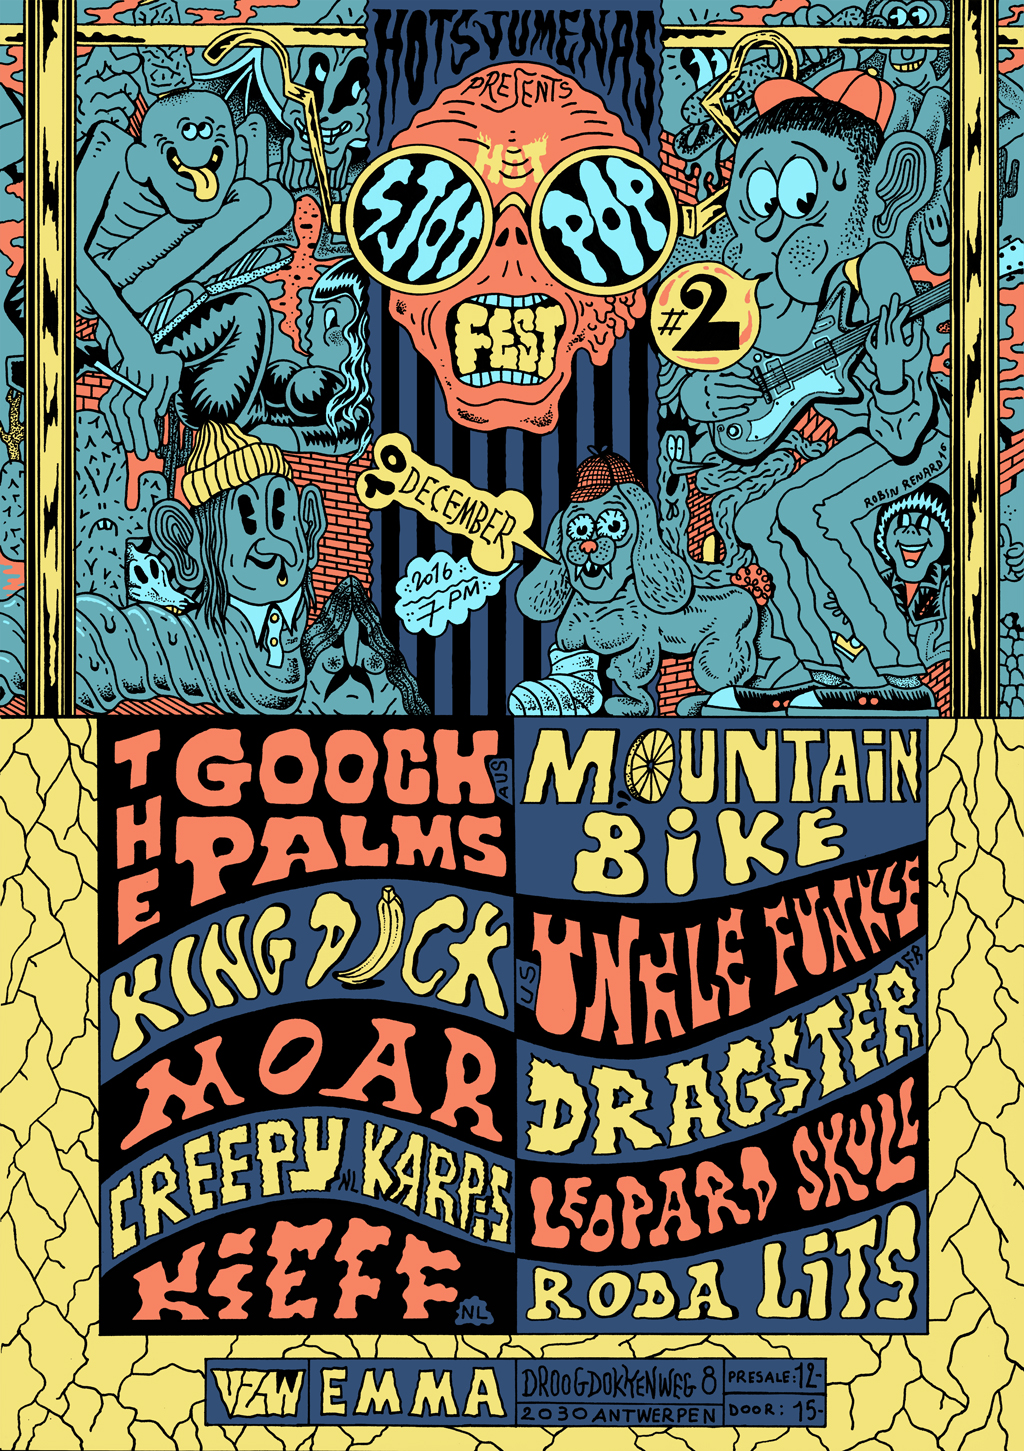 Sjotpopfest-poster